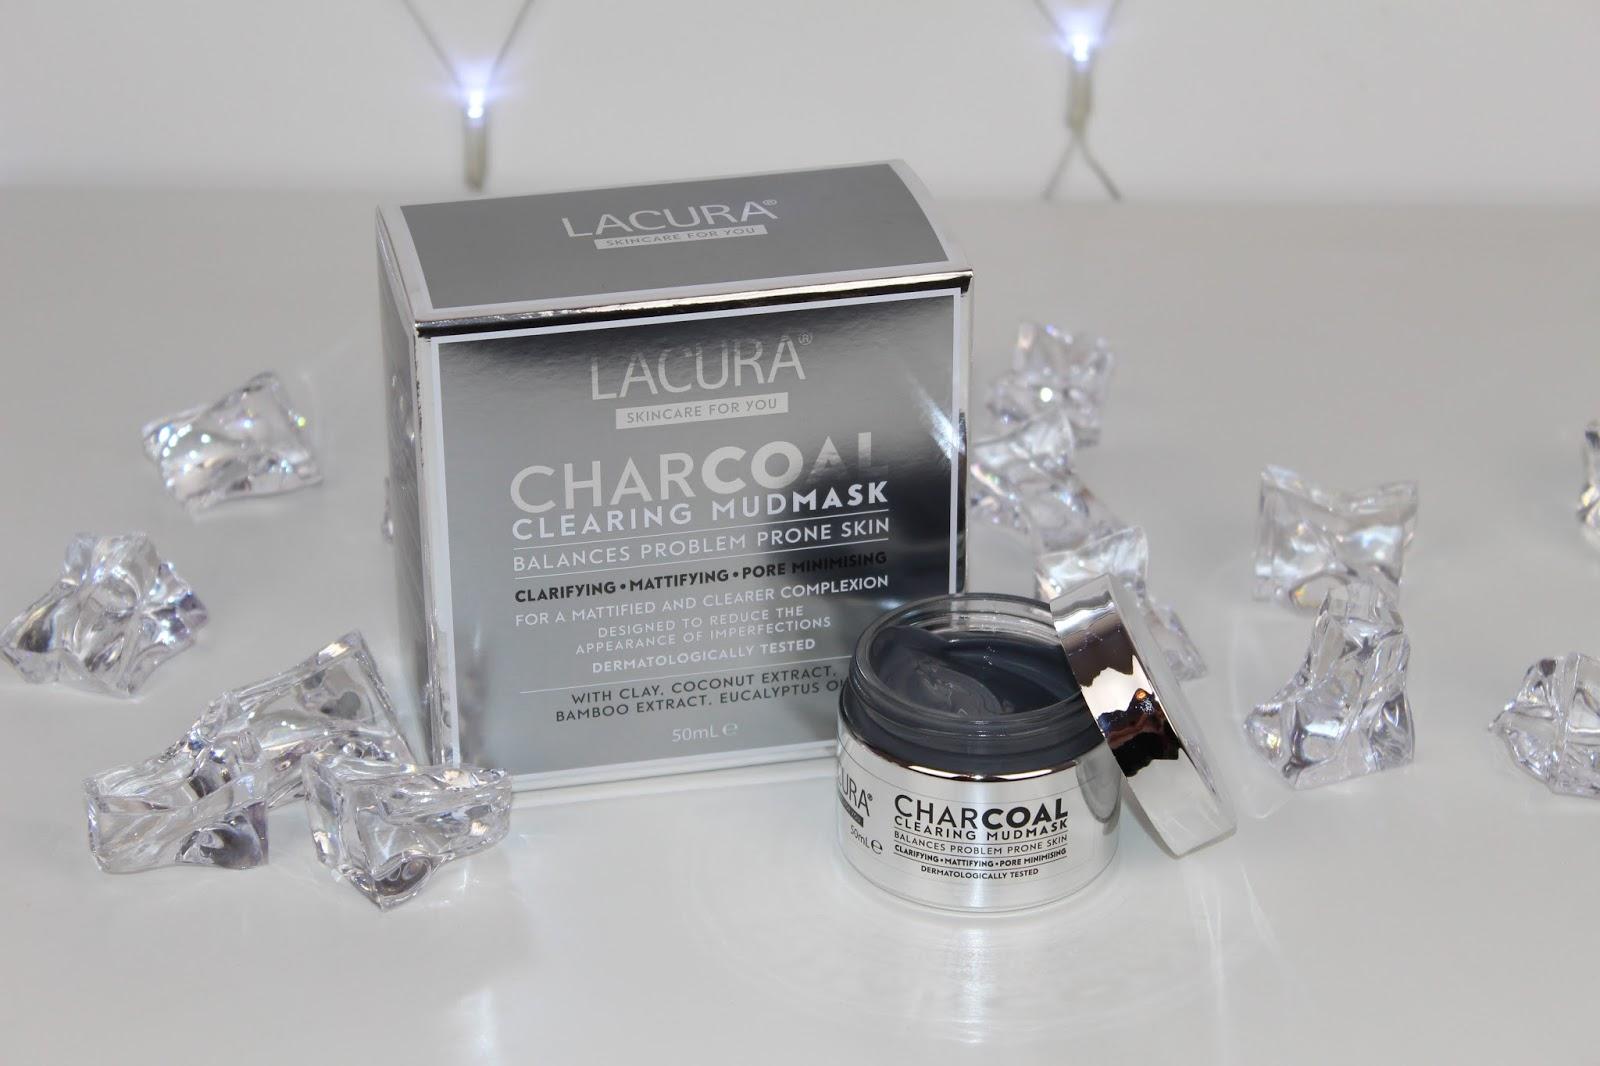 Aldi Charcoal Clearing Mudmask And Charcoal Mud To Foam